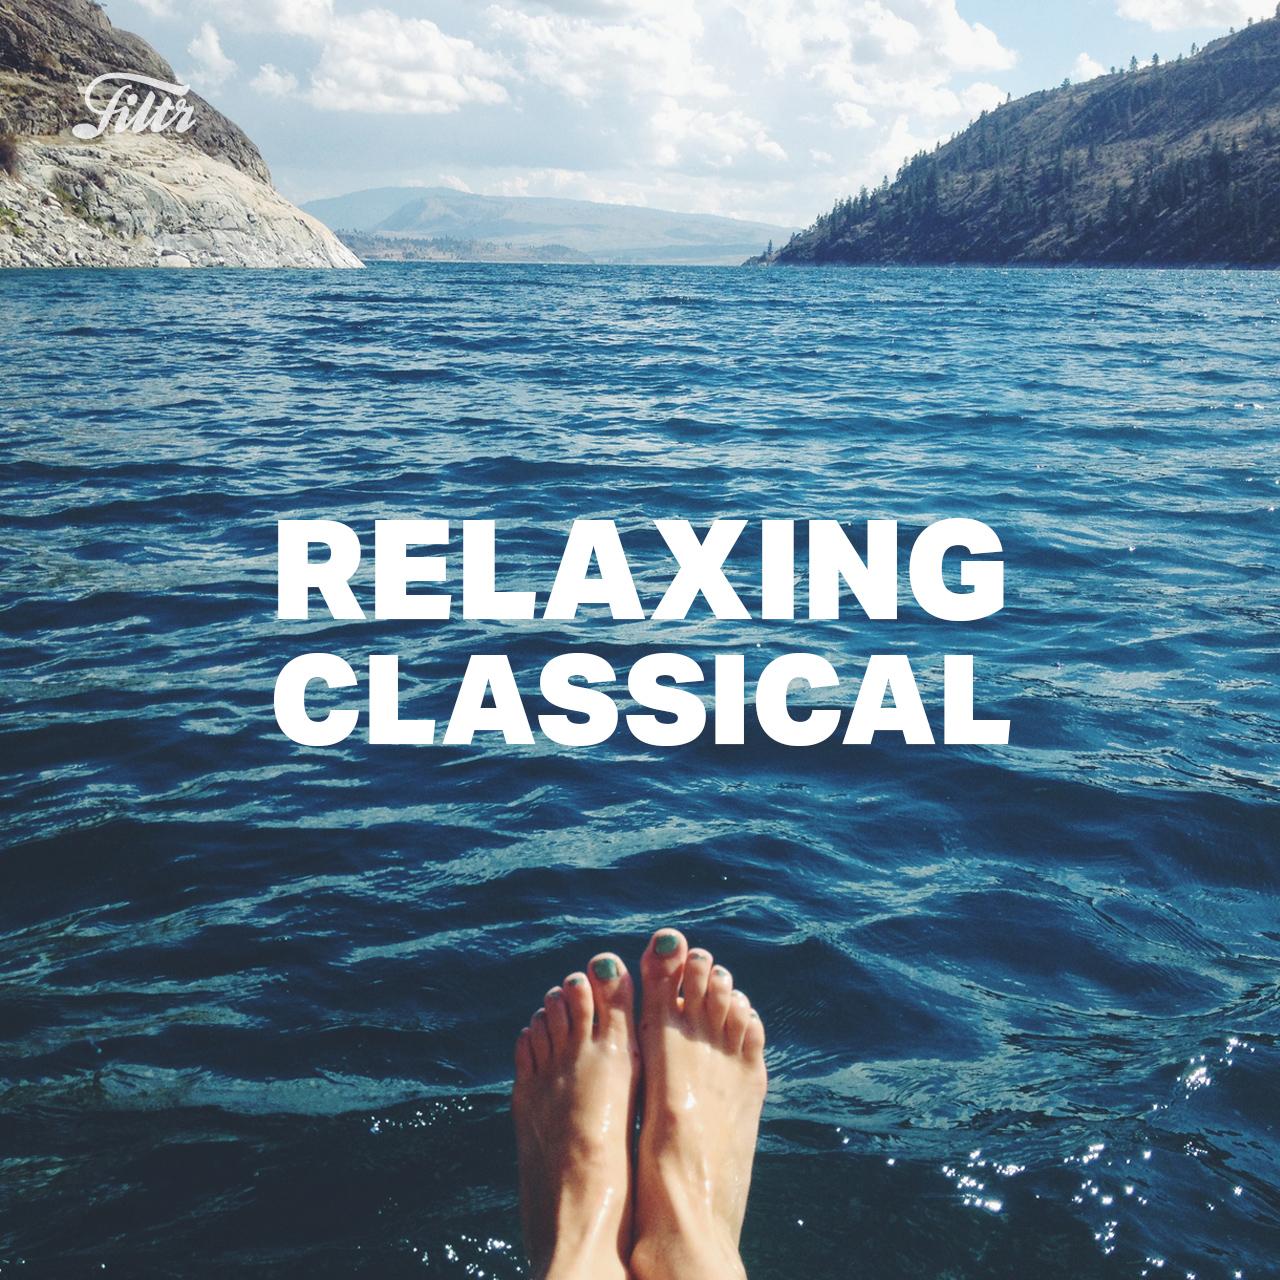 Relaxing-Classical.jpg